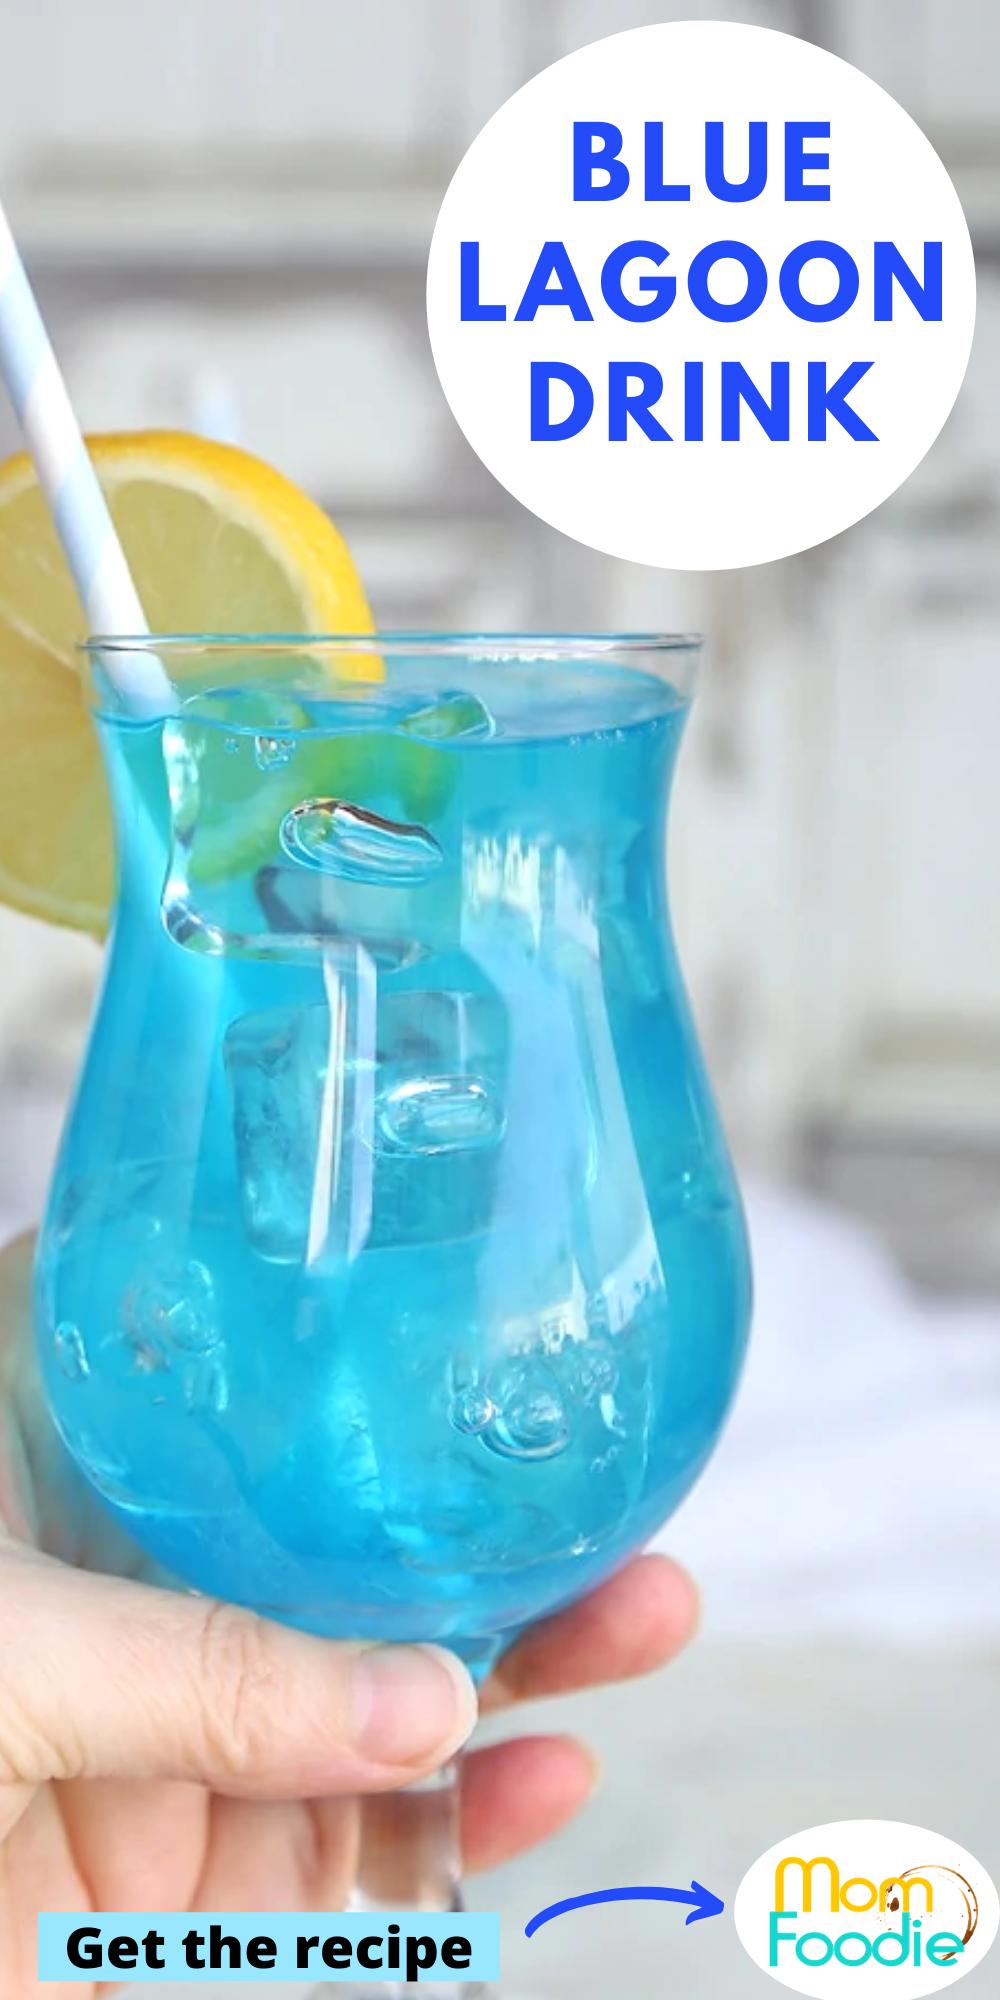 Blue Lagoon Cocktail In 2020 Blue Lagoon Cocktail Blue Alcoholic Drinks Blue Curacao Drinks